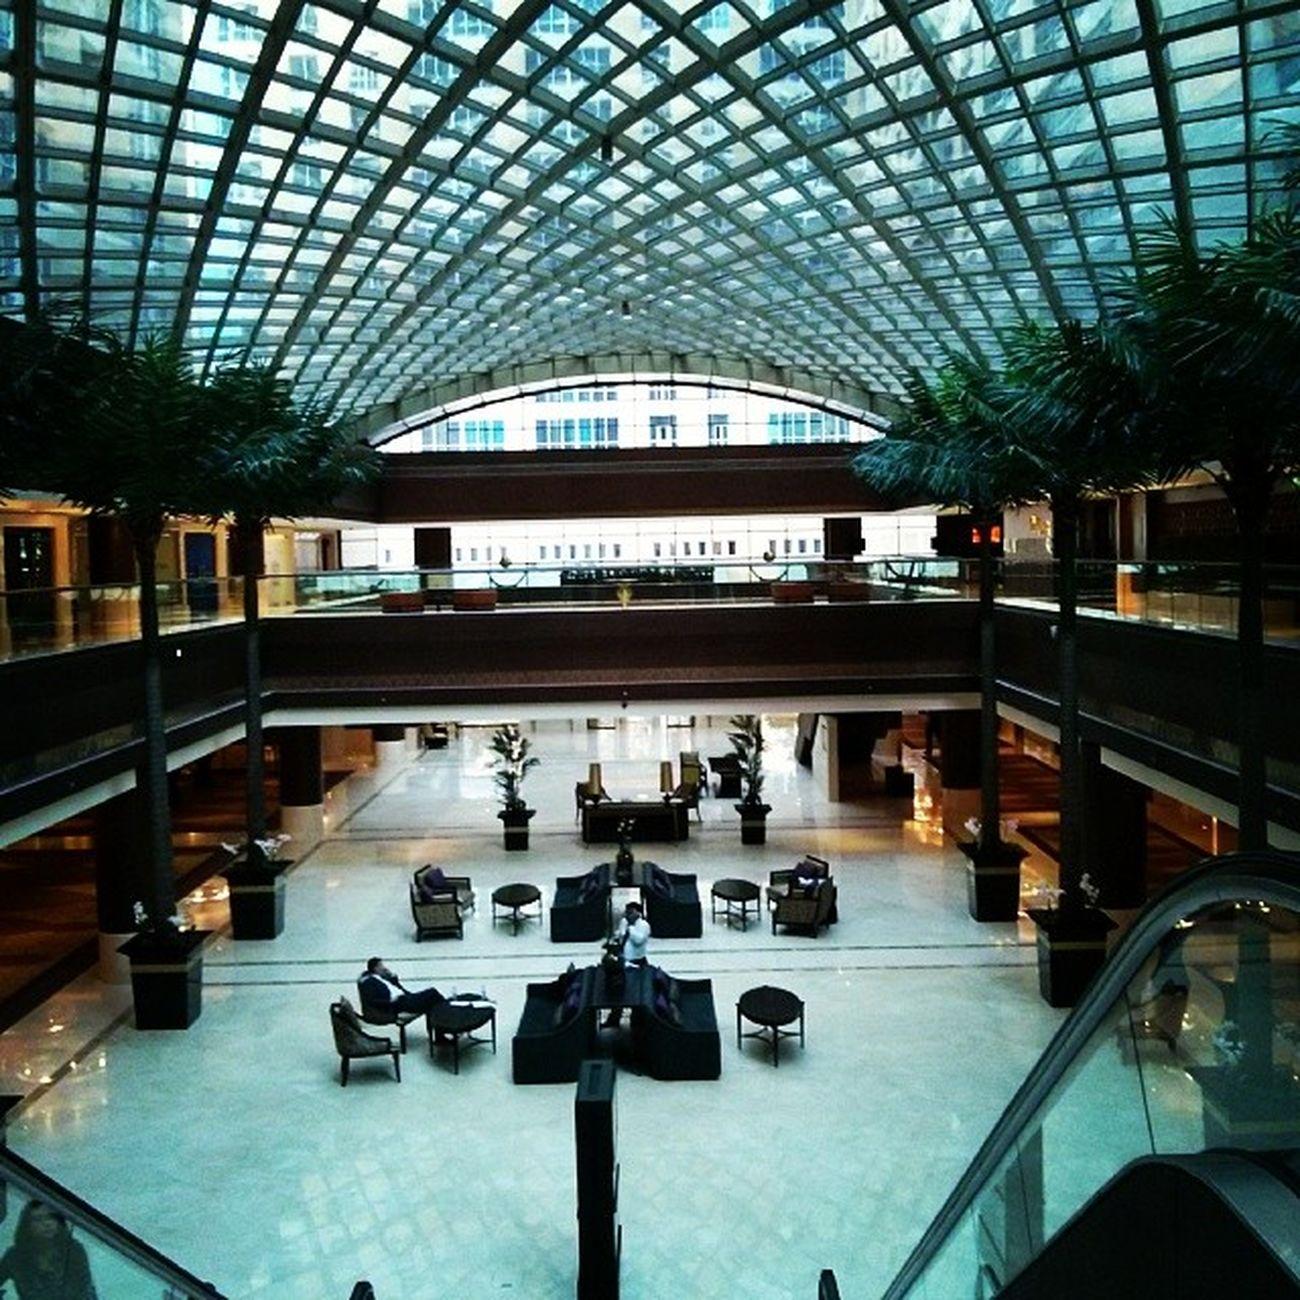 Hotel Travel Abudhabi UAE Dubai Instagood Instanice Luxury